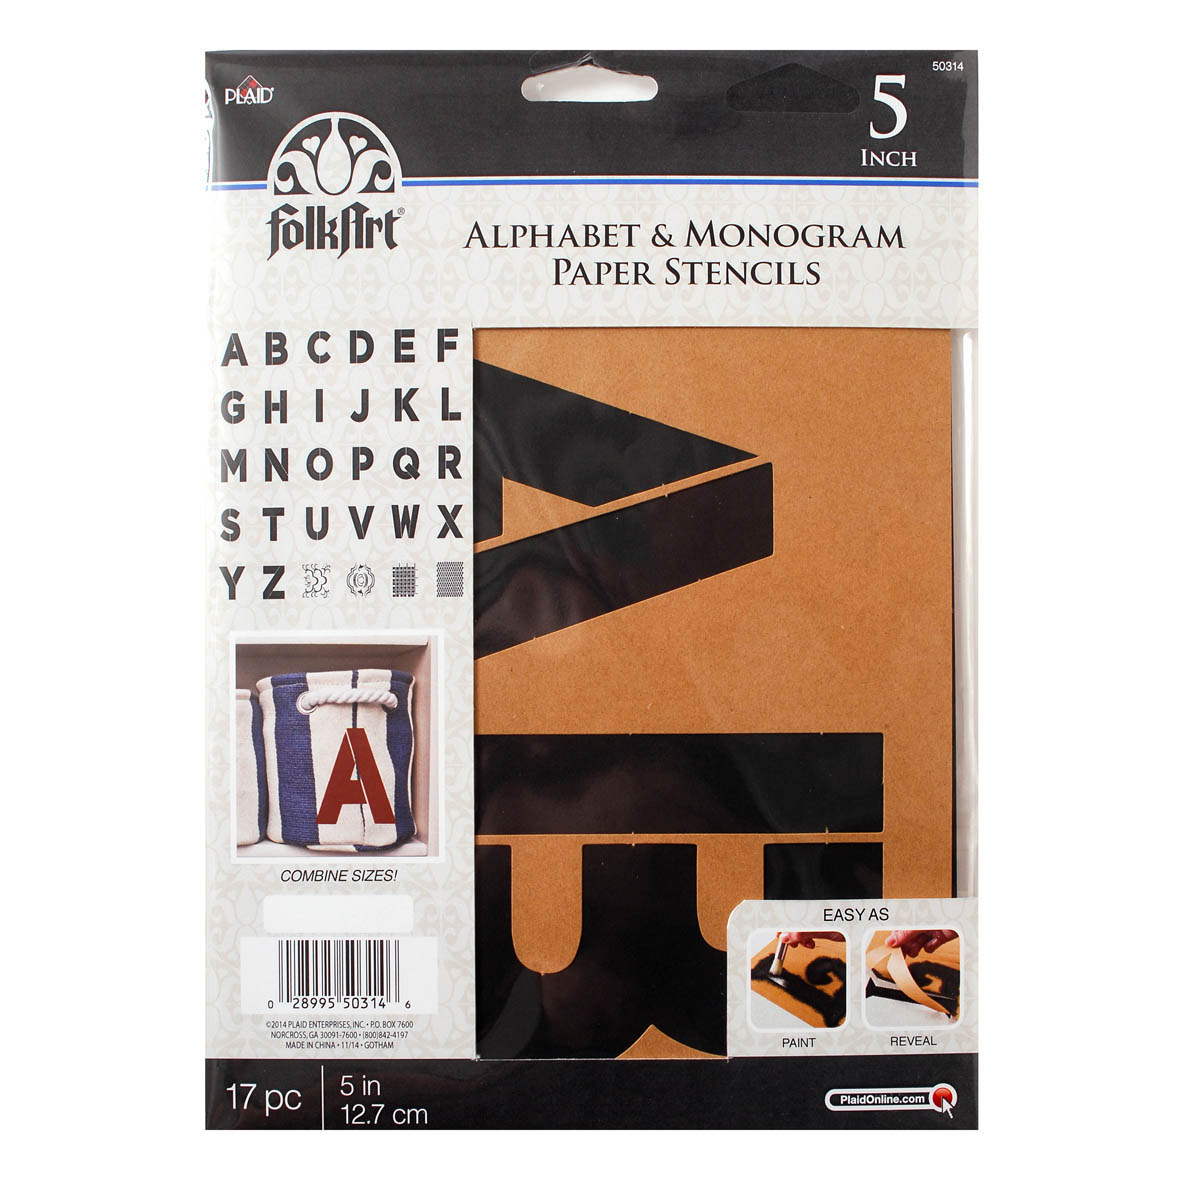 FolkArt ® Alphabet & Monogram Paper Stencils - Bold Font, 5